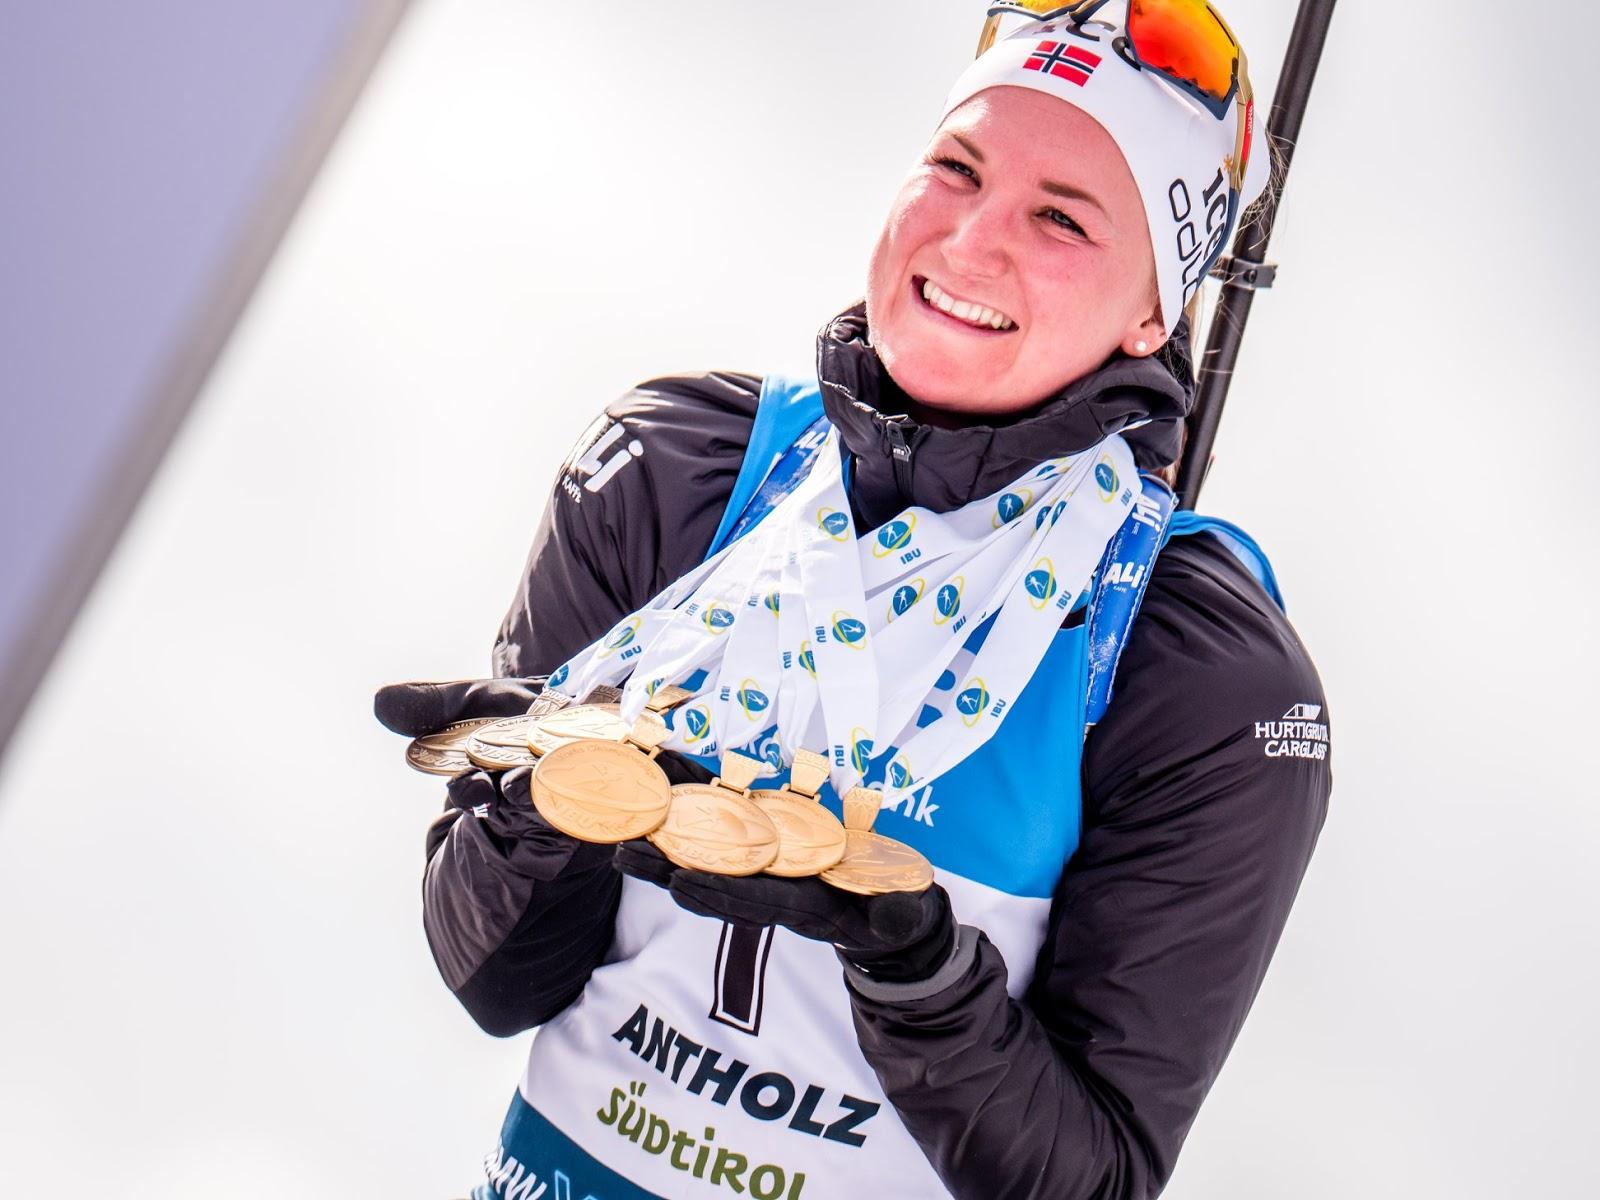 Mundial De Biatlo 2020 Ultimo Dia Marte Olsbu Roiseland